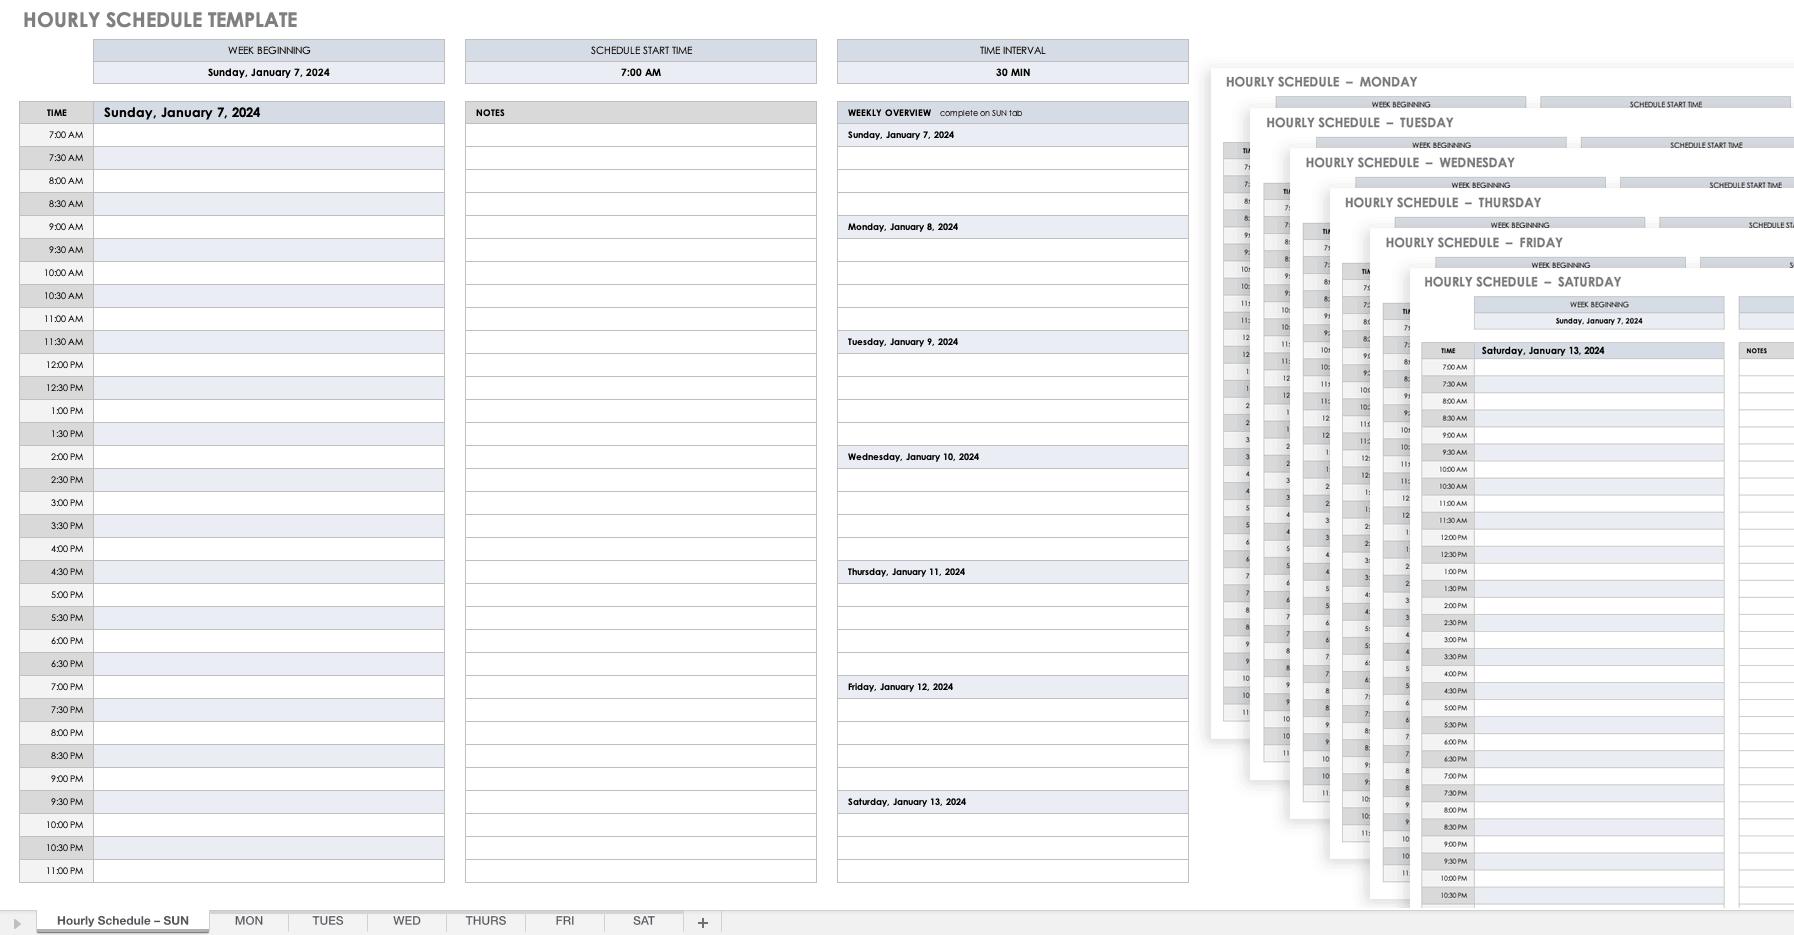 Hourly Schedule Template